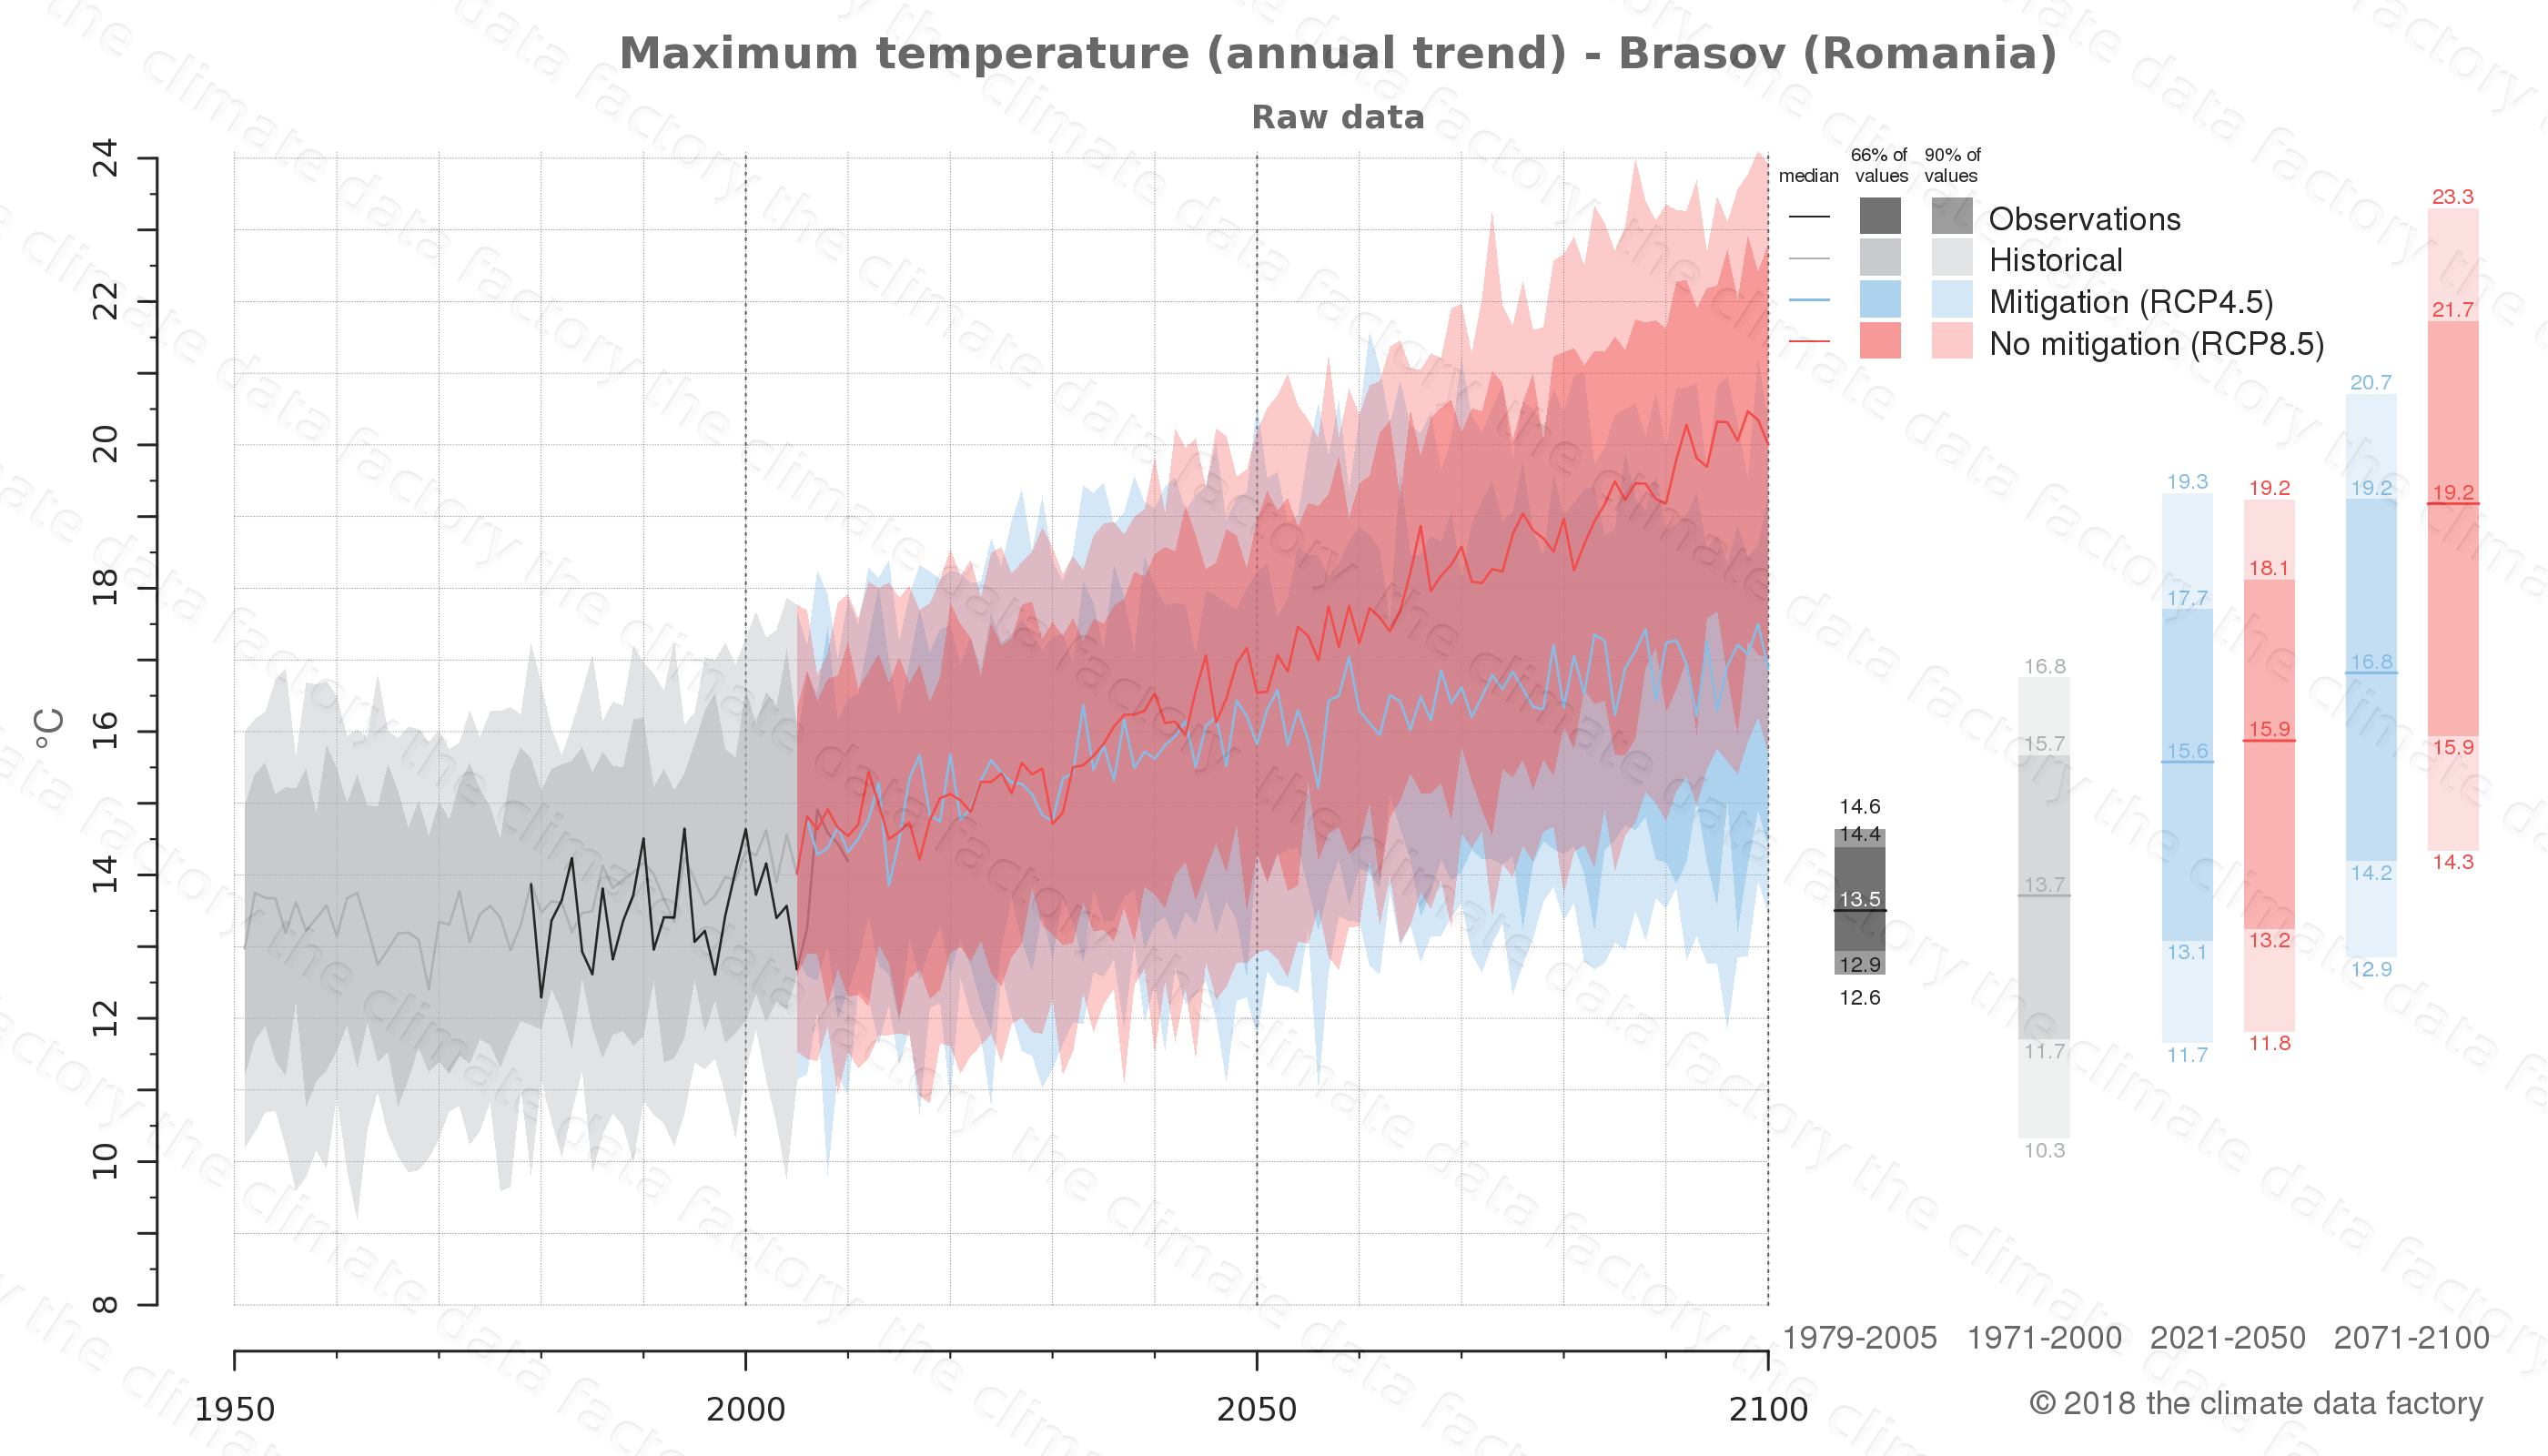 climate change data policy adaptation climate graph city data maximum-temperature brasov romania